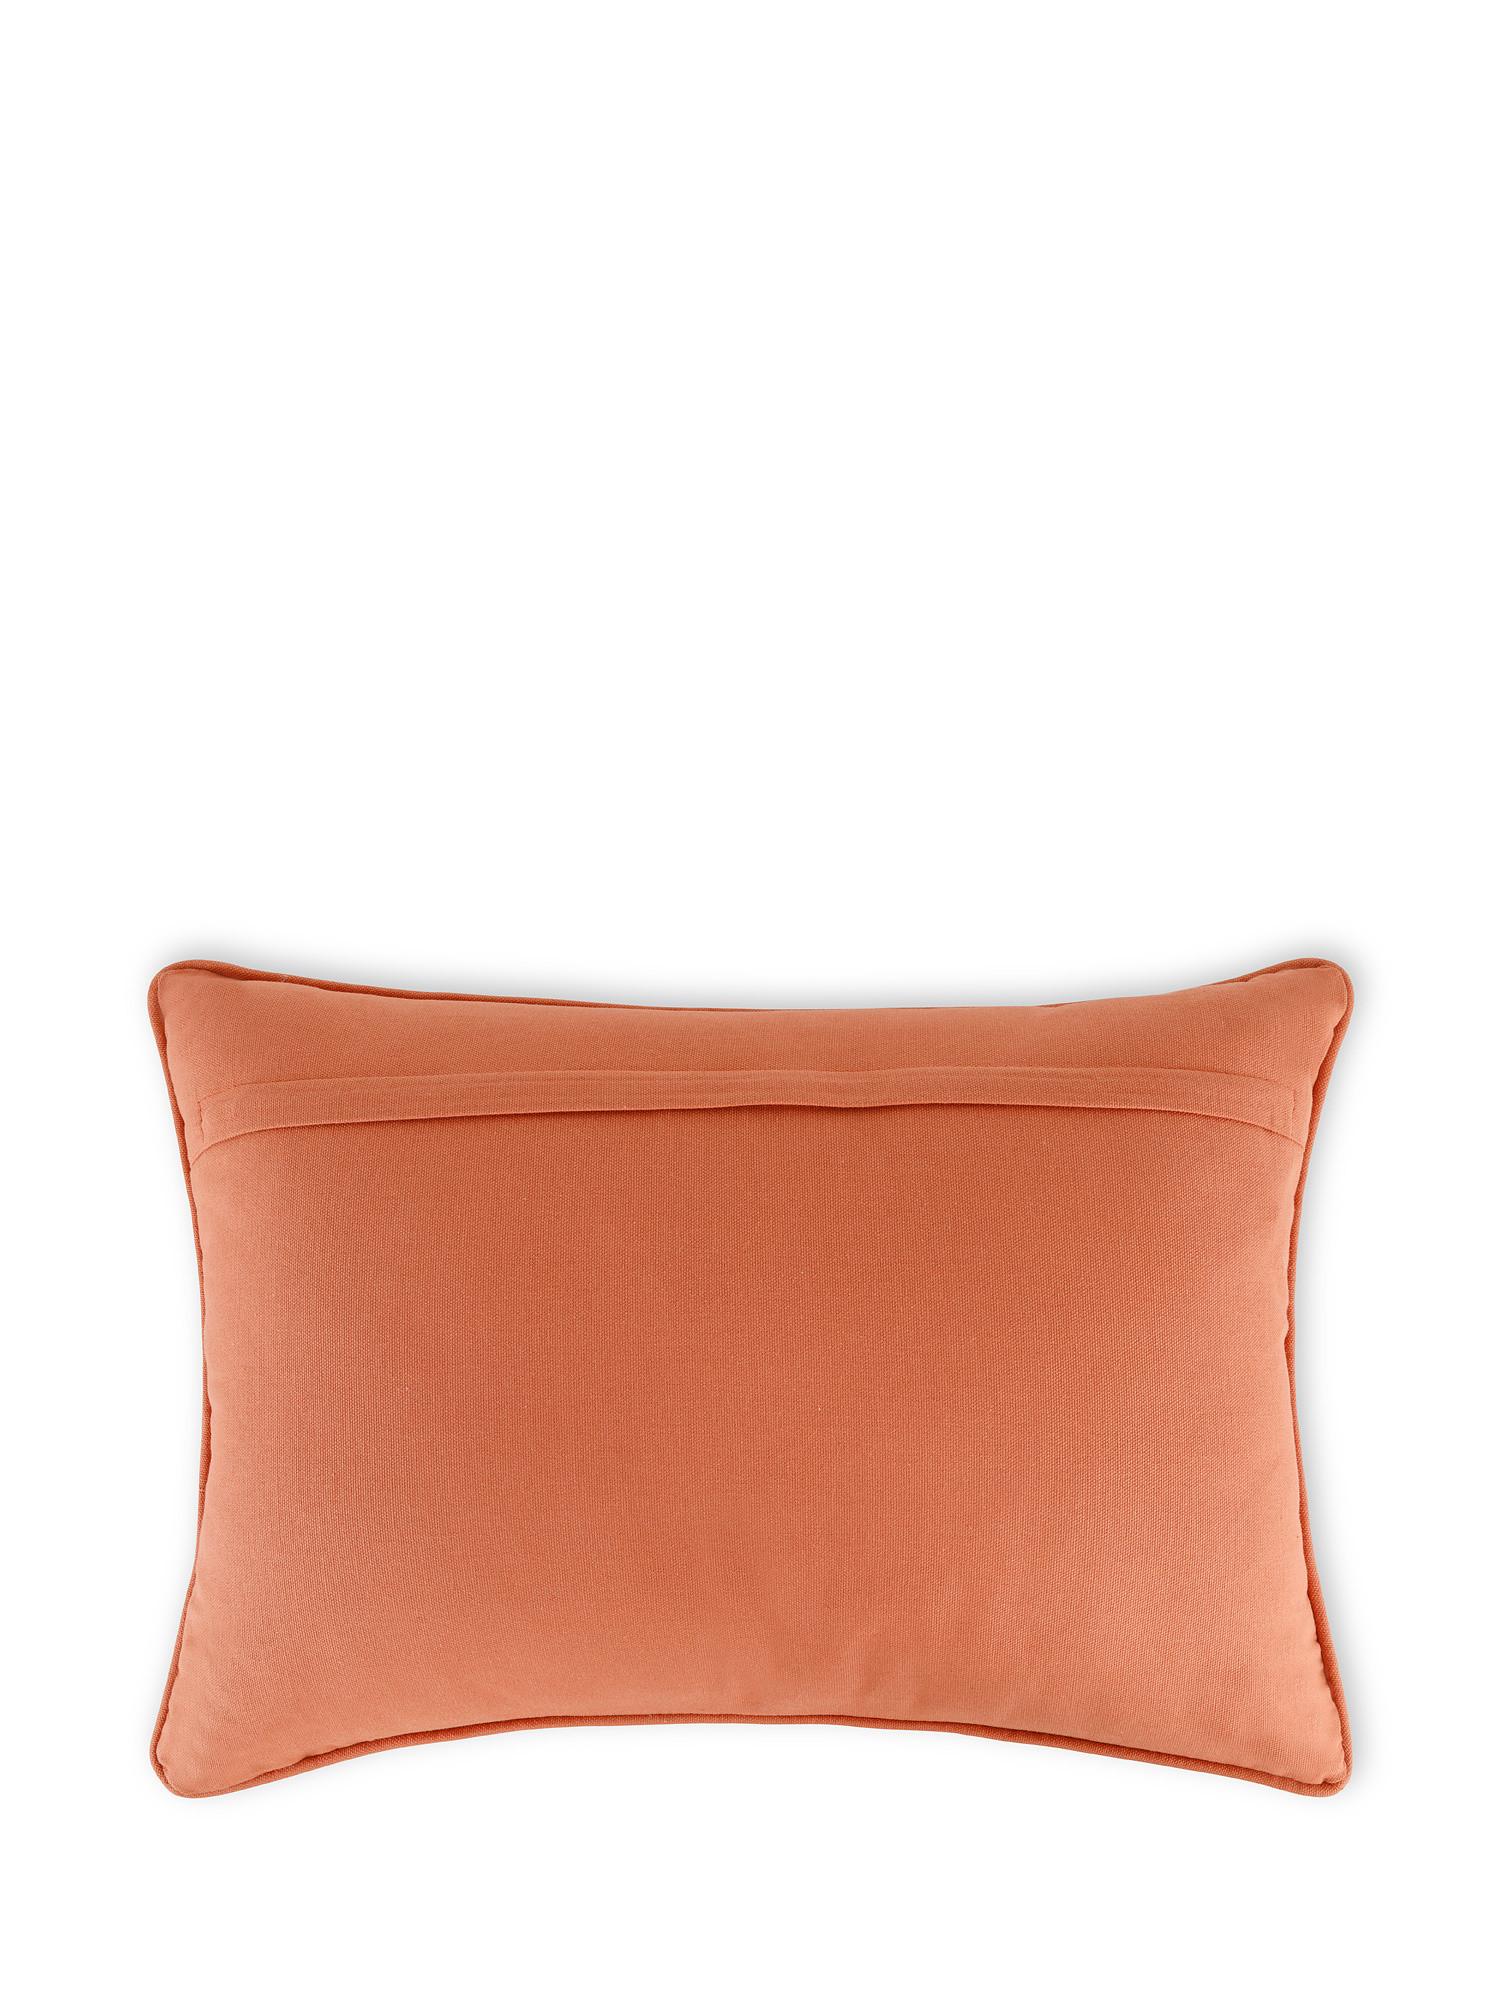 Cuscino cotone ricamo floreale 35x50cm, Multicolor, large image number 1